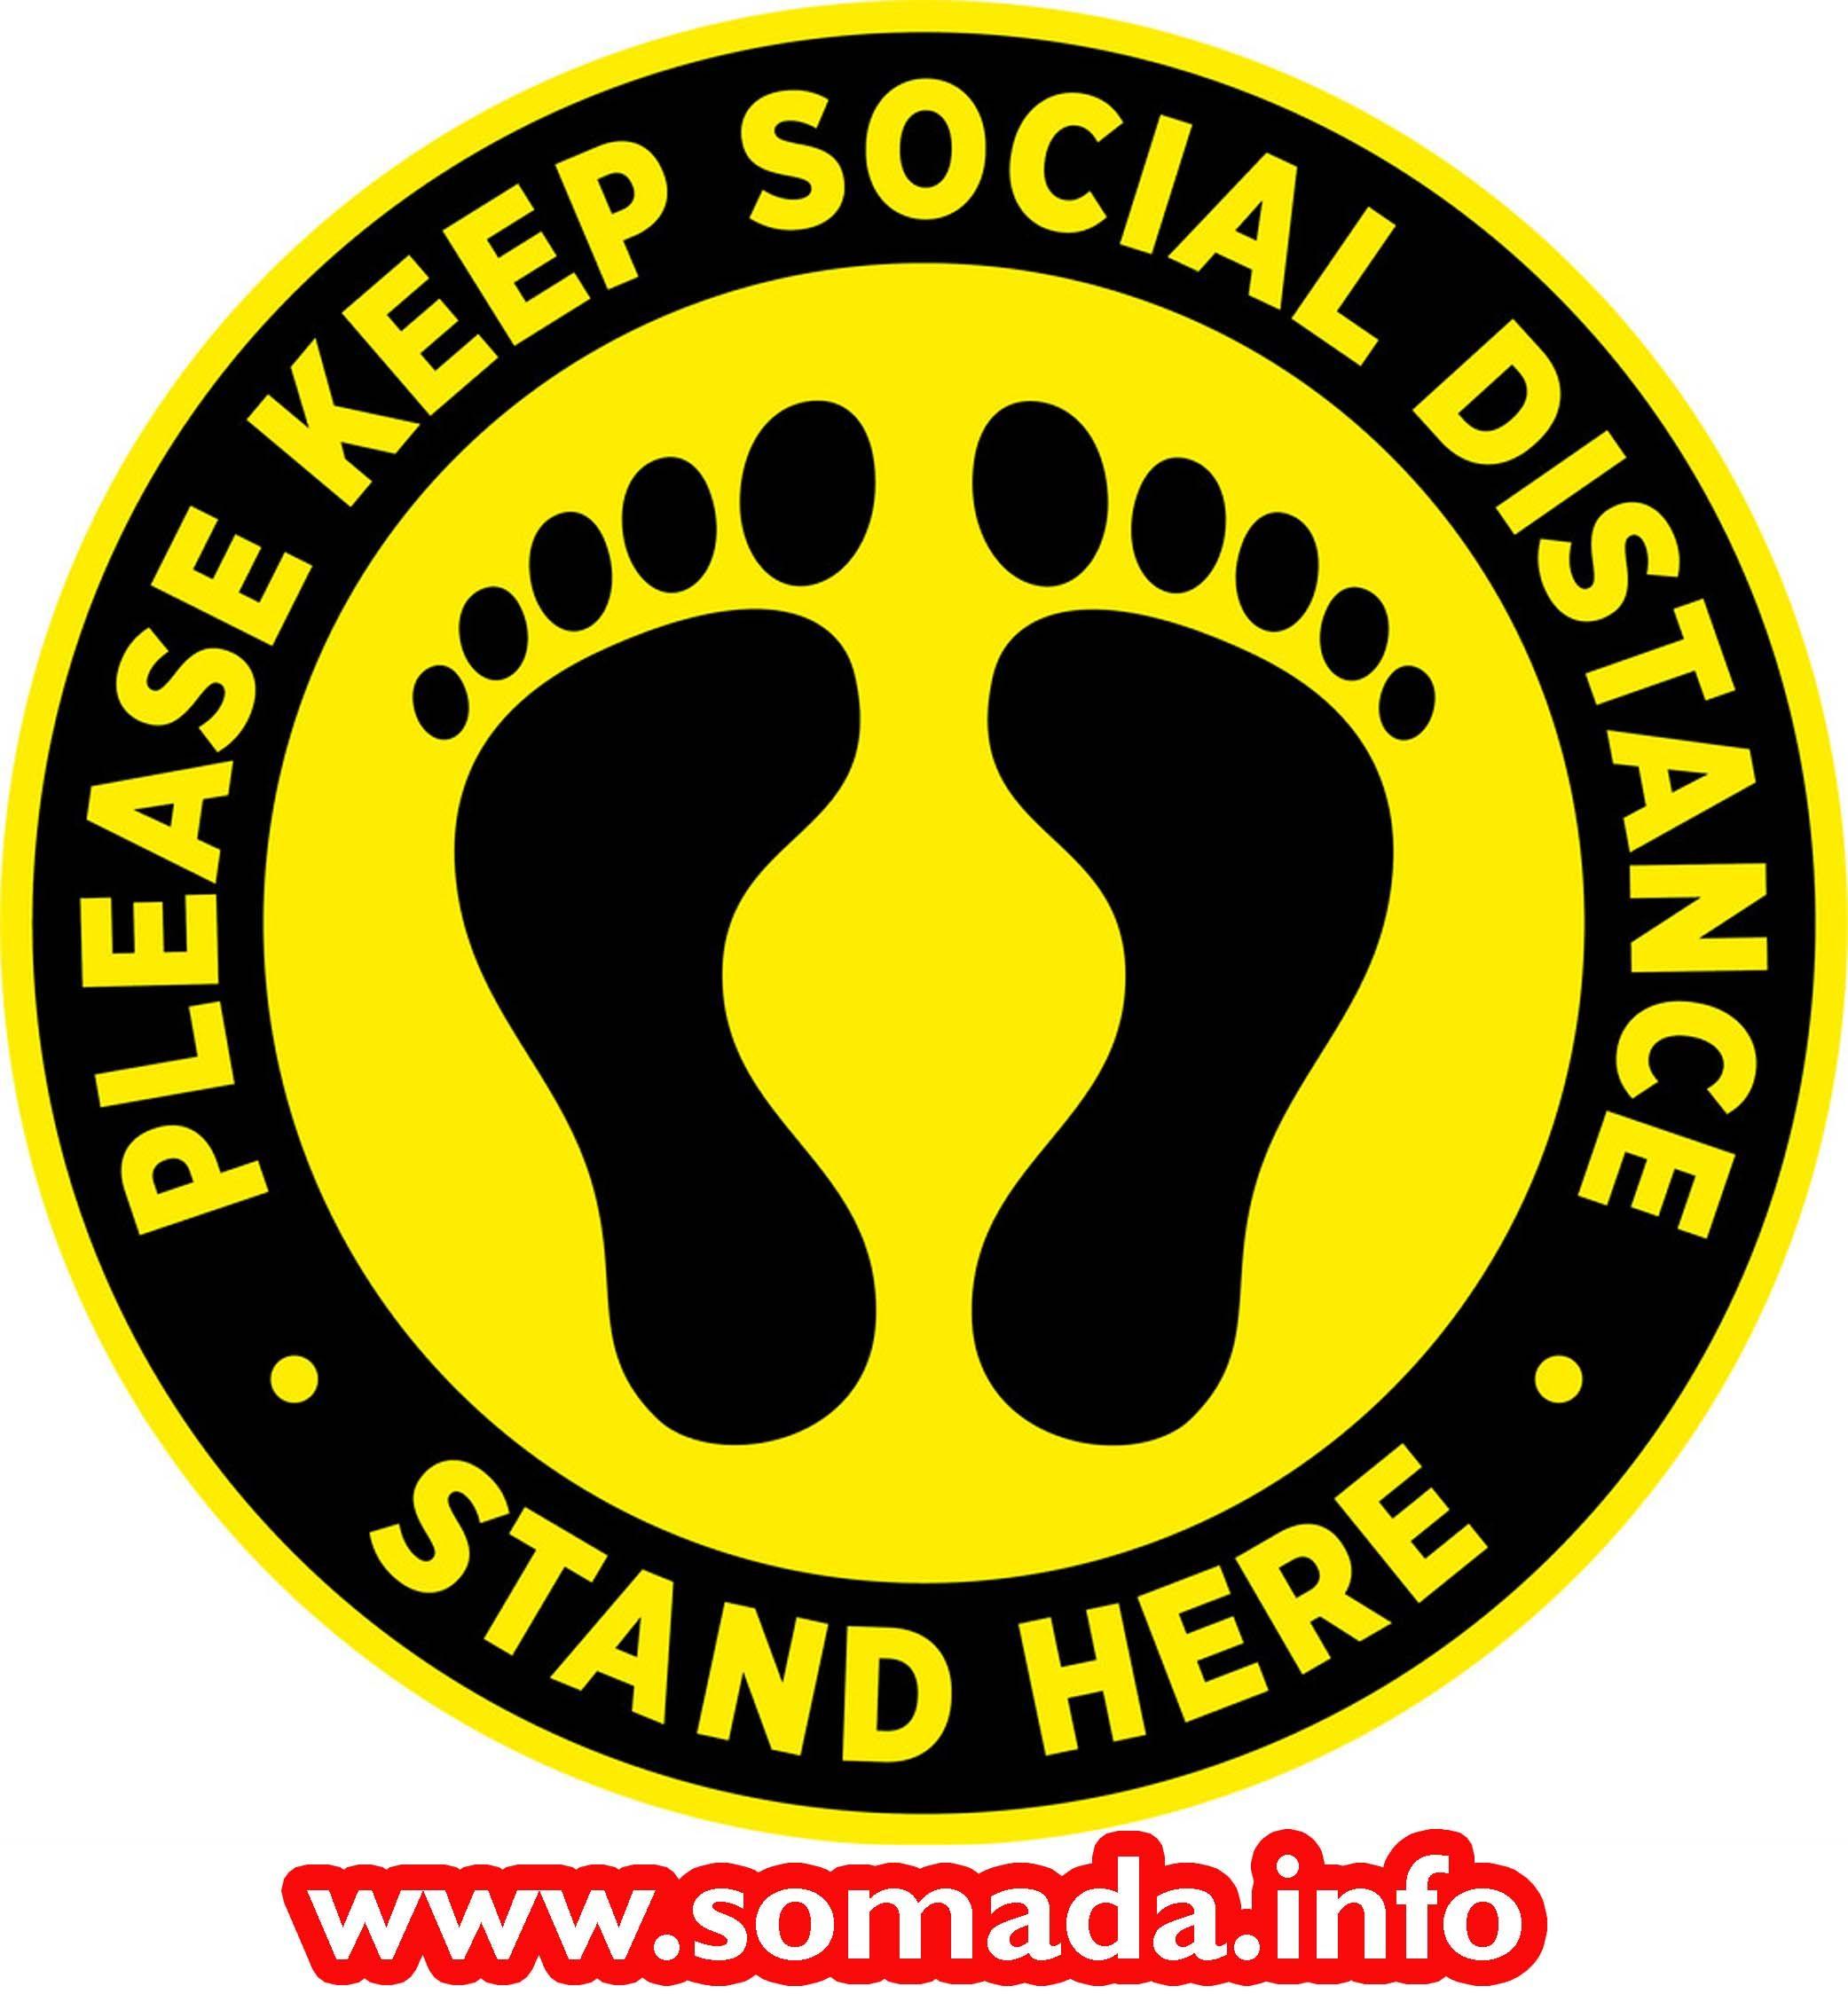 Social Distancing Floor Decals 5 Pack 12 Round Self Adhesive Vinyl Stickers Floor Stickers Signage Floor Decal